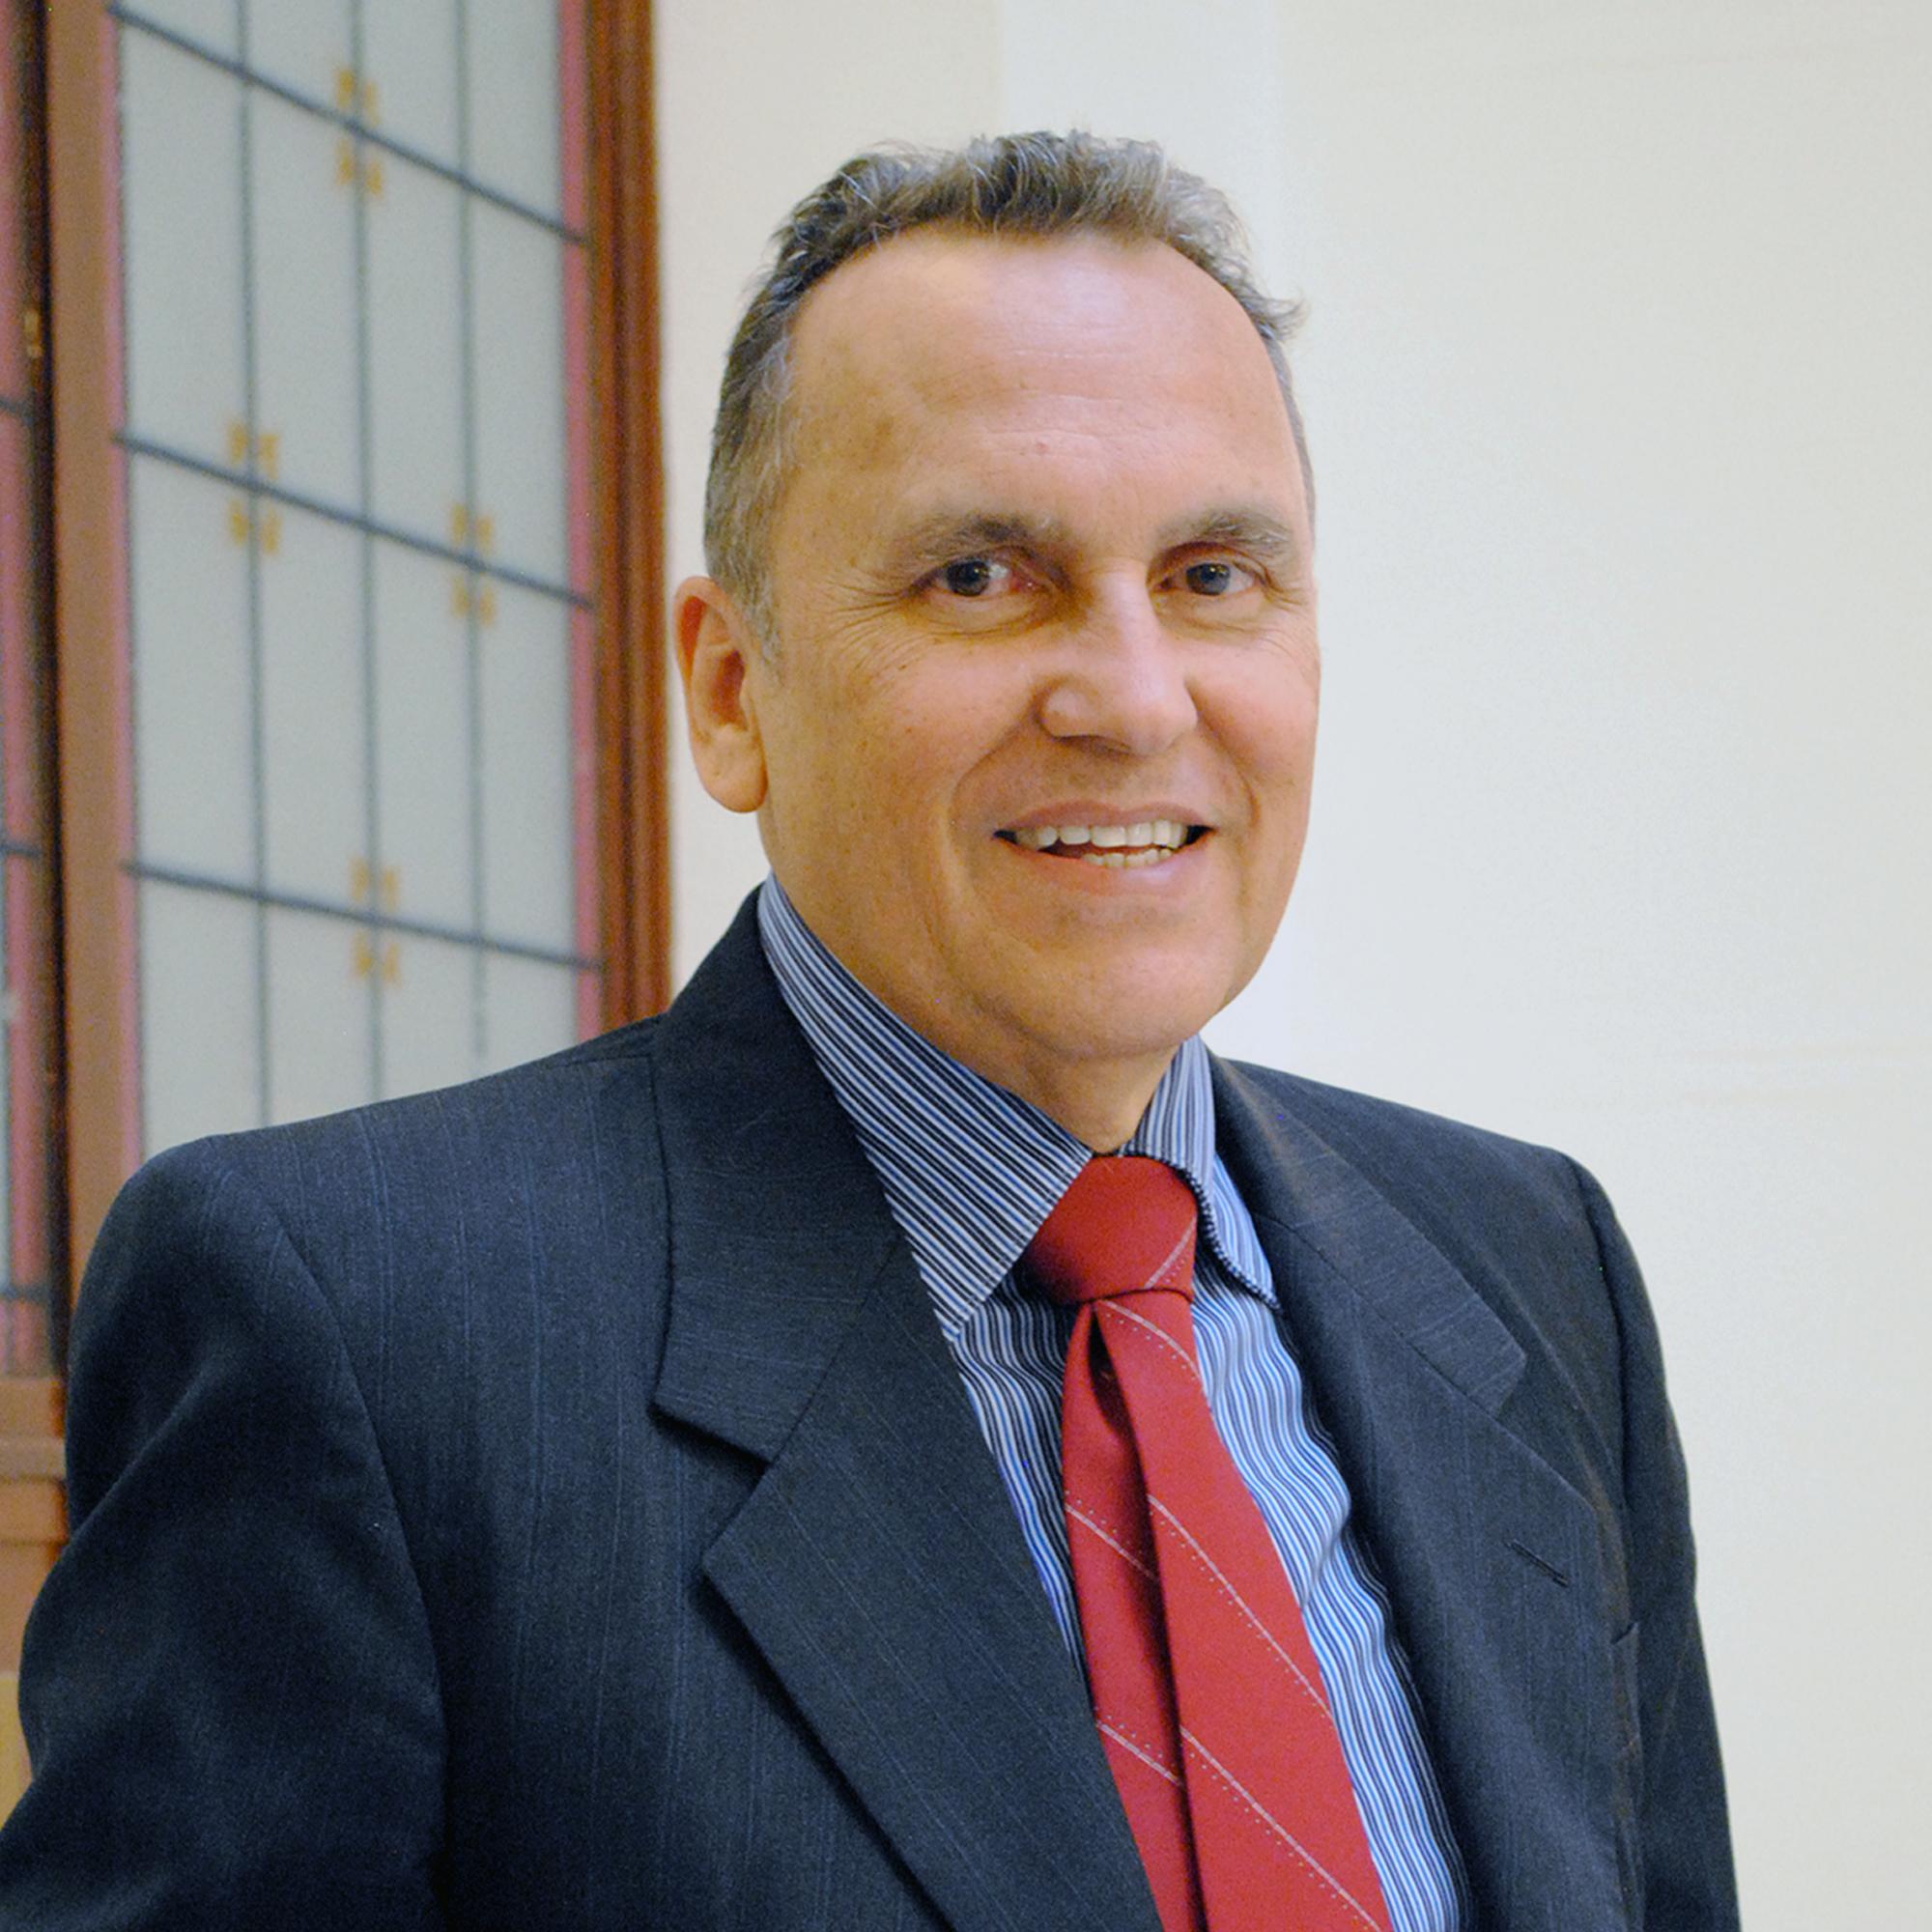 D. ROBERTO QUINTERO MARIÑO